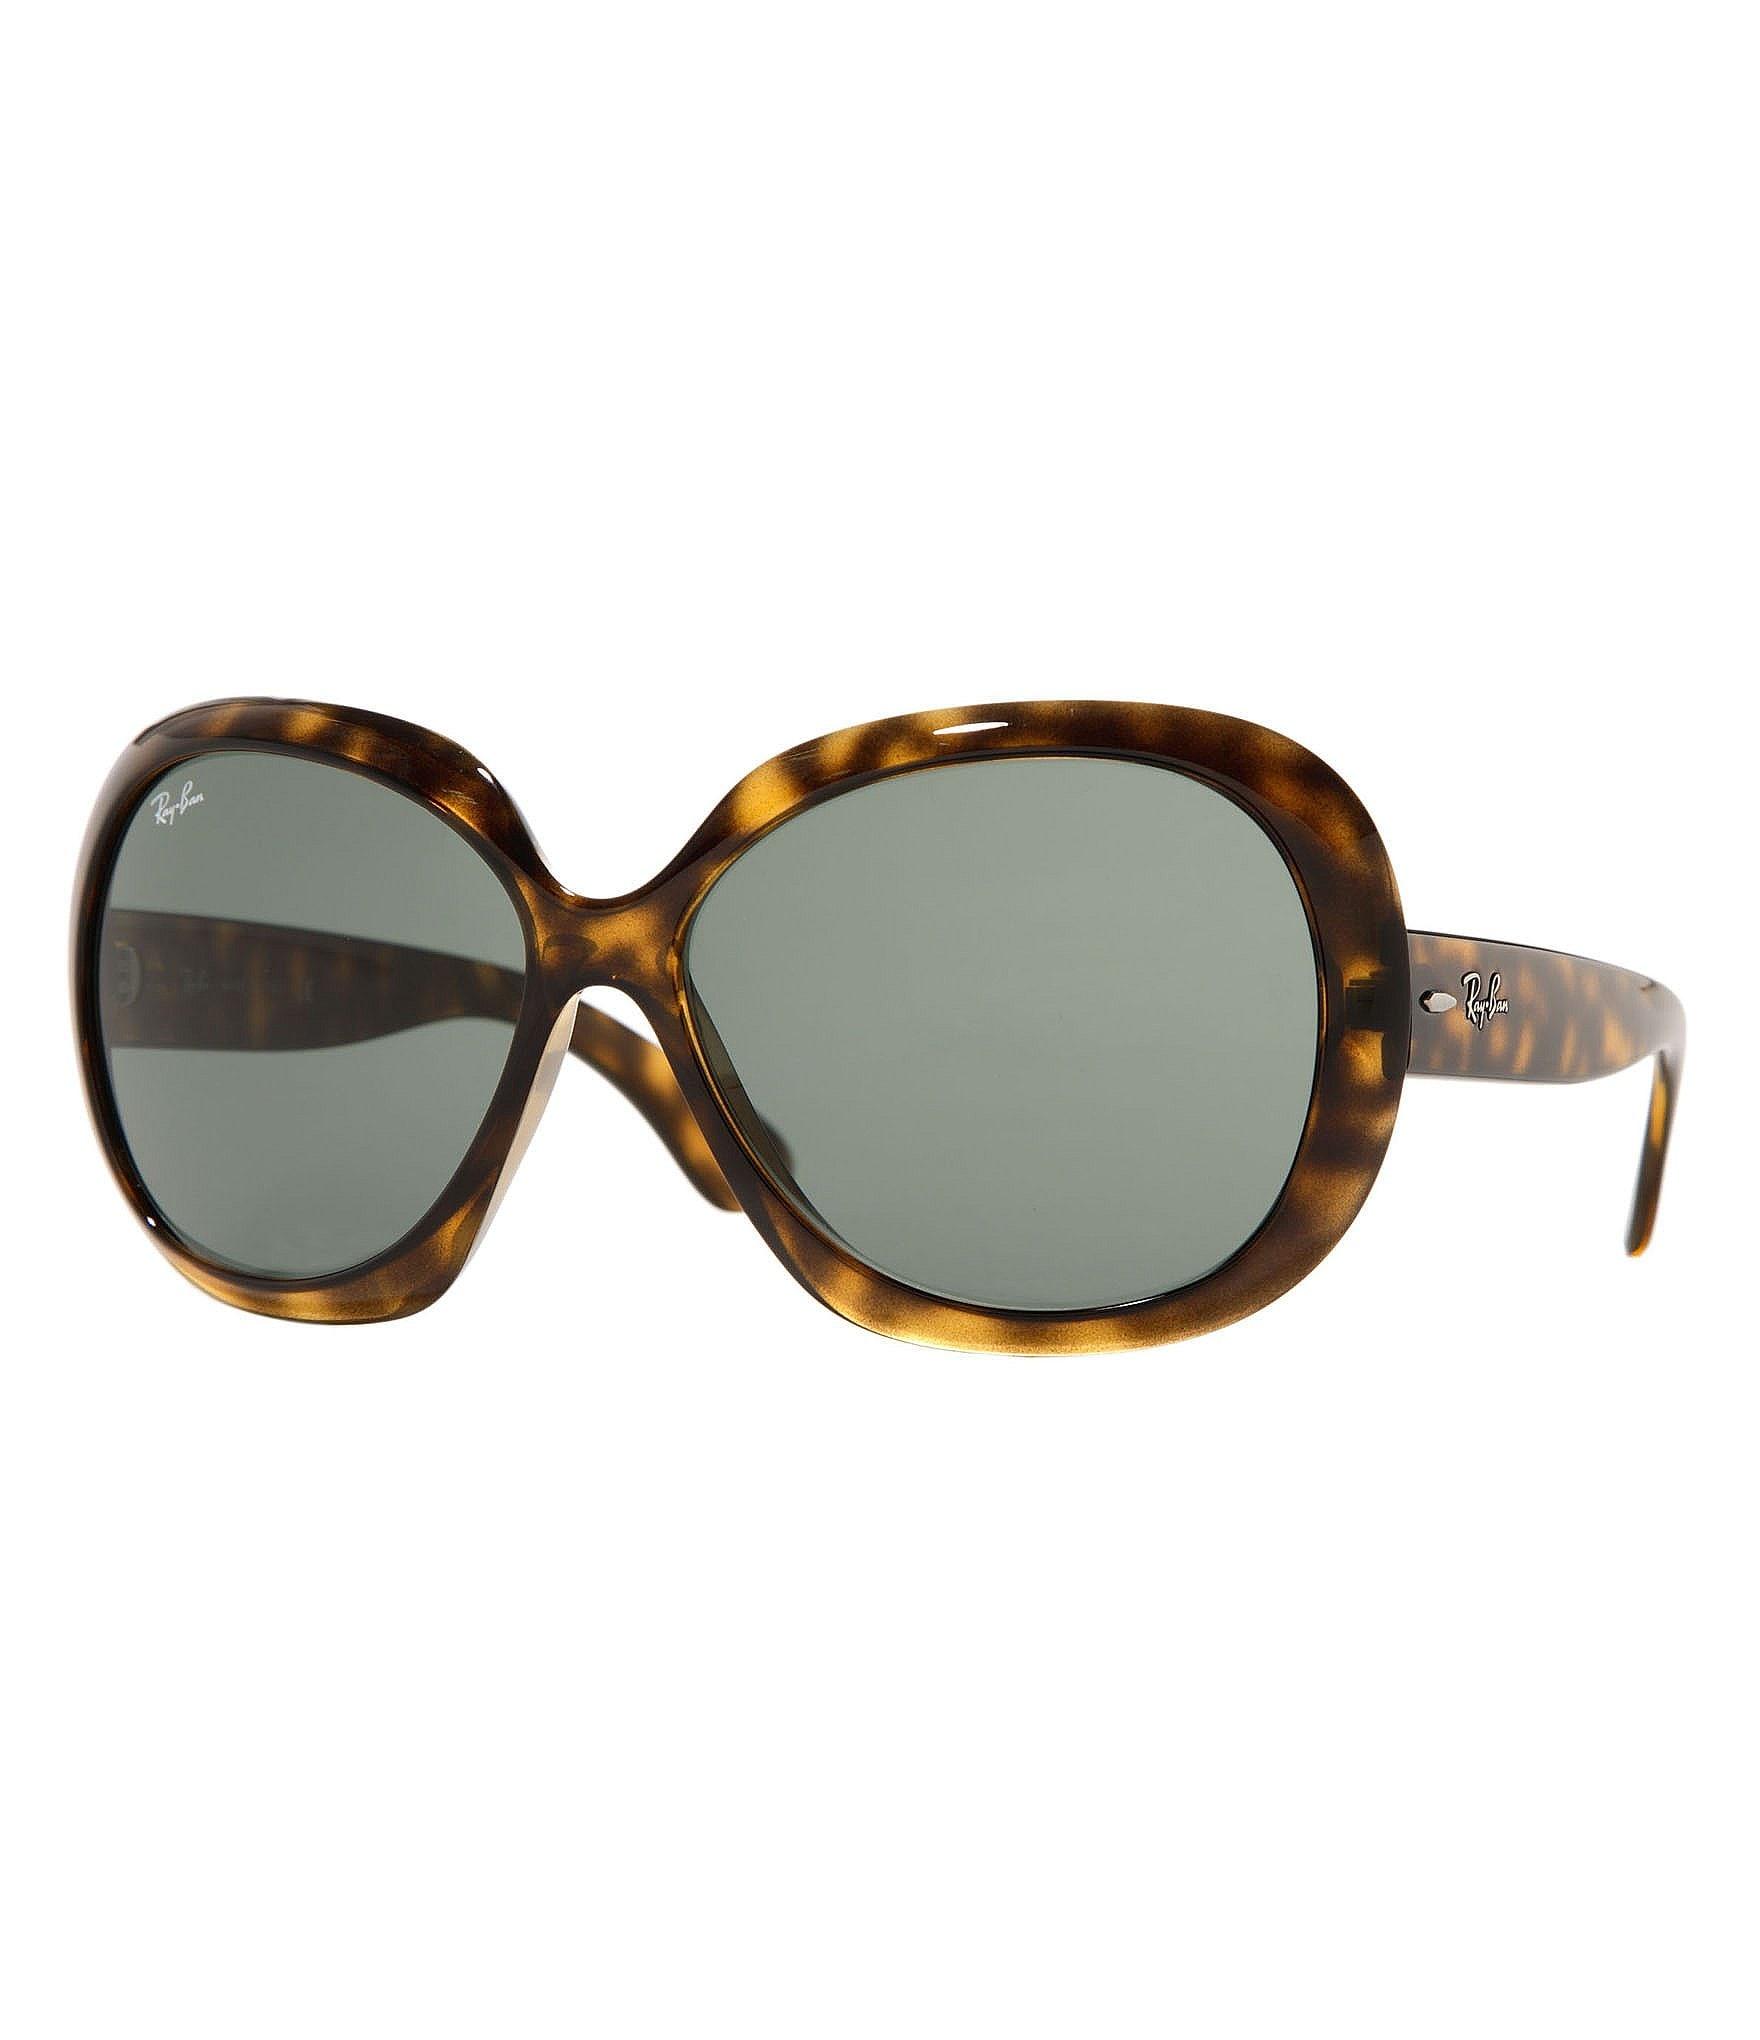 ray ban jackie ohh ii oversized sunglasses dillards. Black Bedroom Furniture Sets. Home Design Ideas